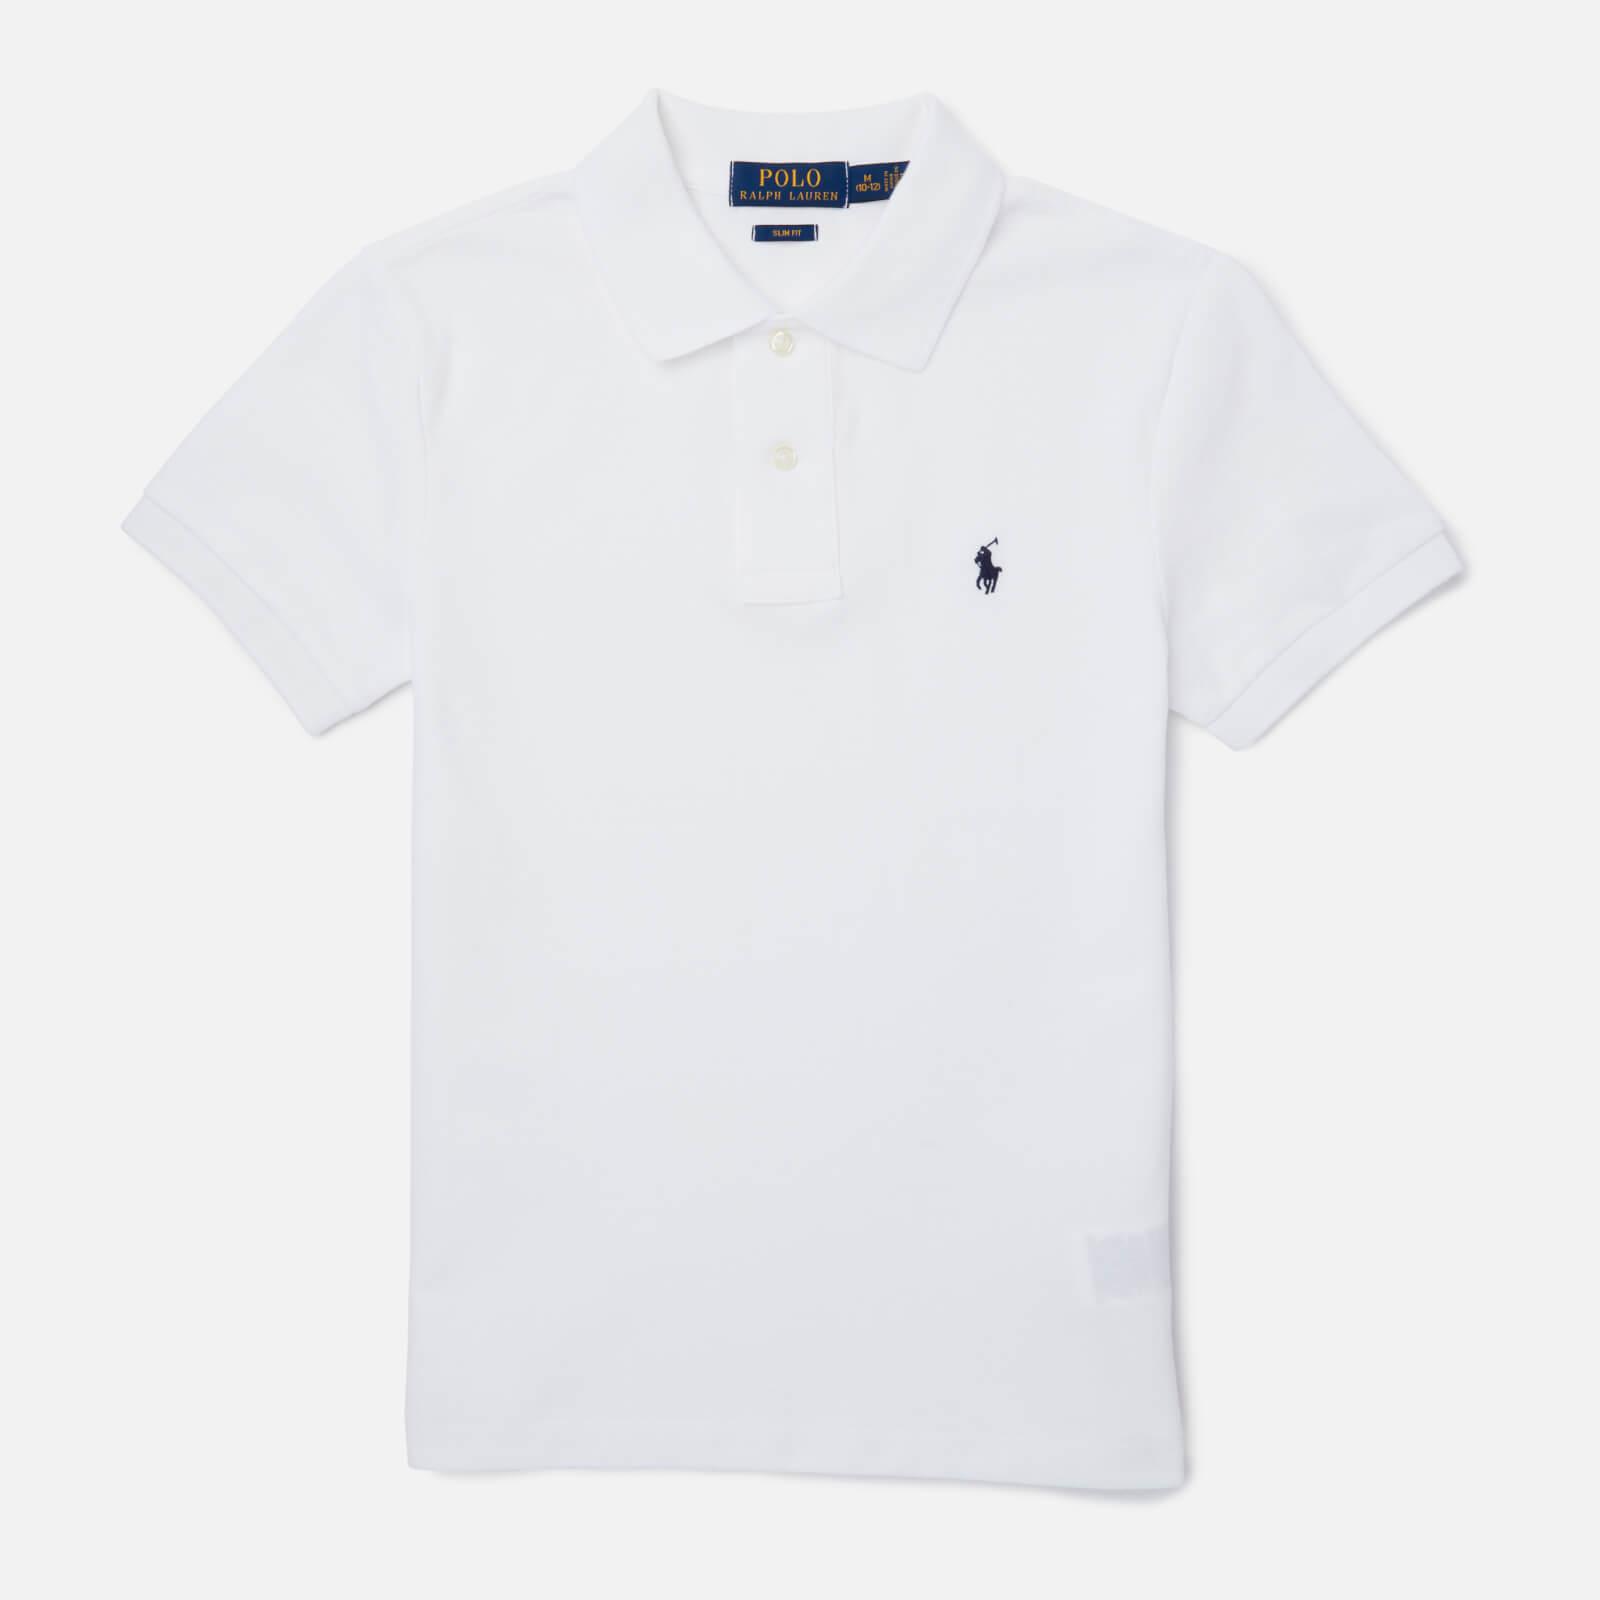 Polo Ralph Lauren Boys' Polo-Shirt - White - 8 Years